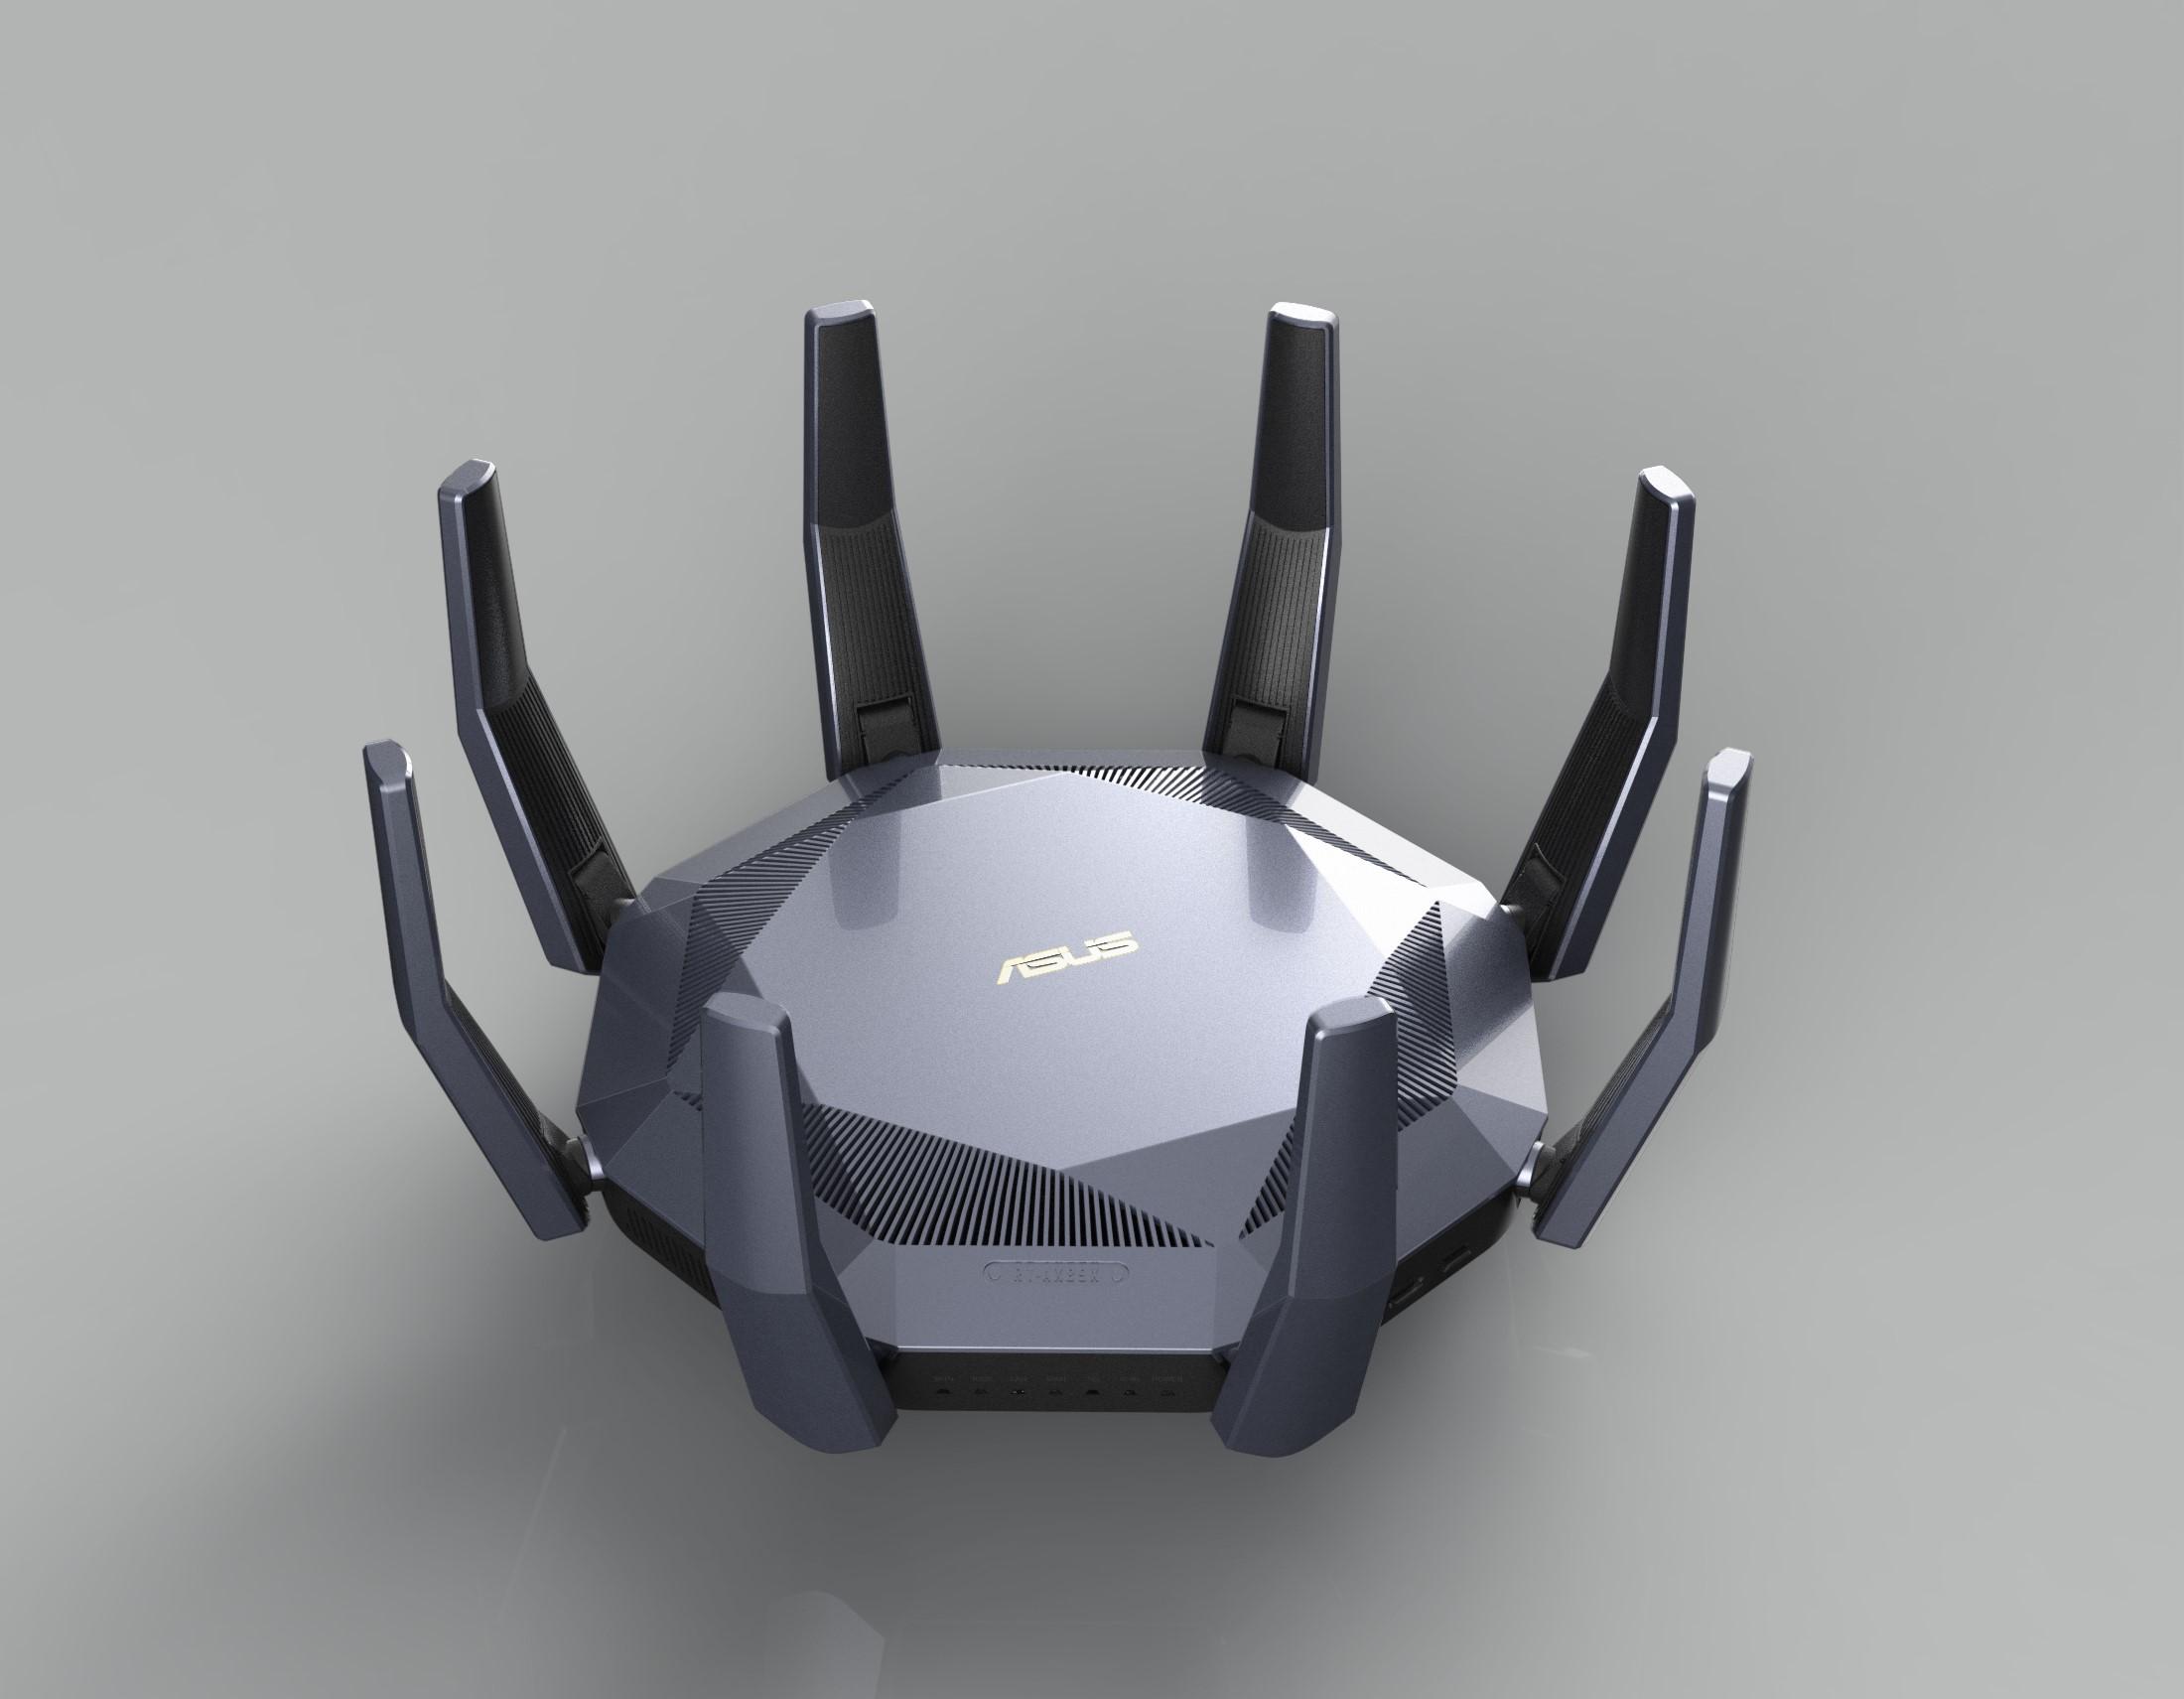 ASUSTeK Computer Inc.-Dual-band Wi-Fi router